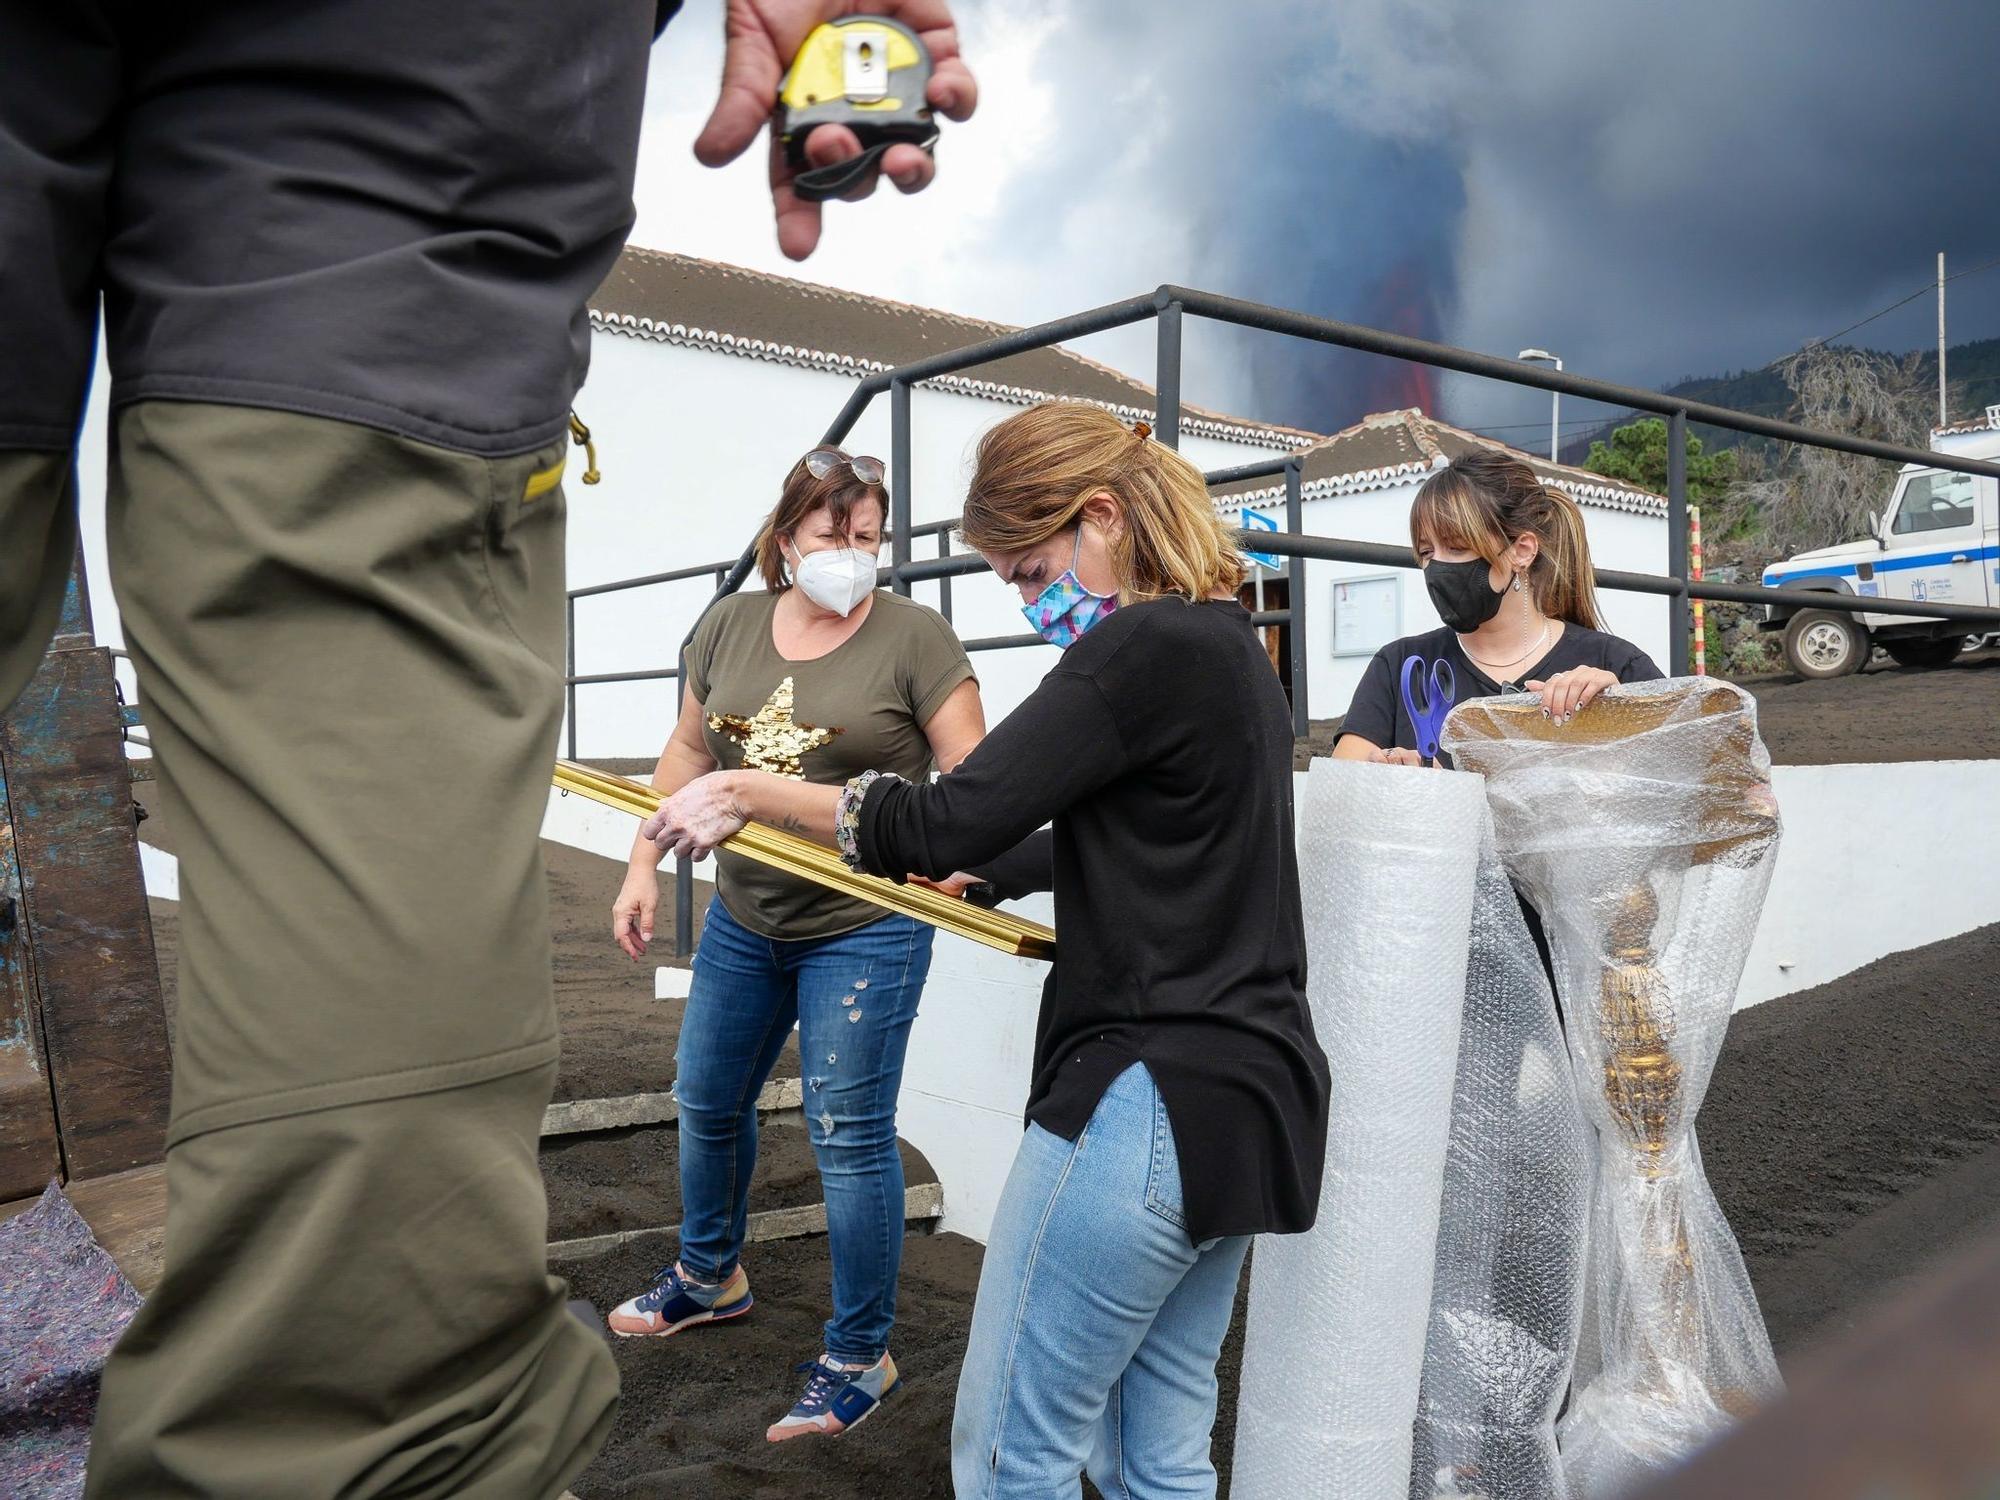 Trasladan las reliquias de la iglesia de San Nicolás ante el avance de la lava en La Palma